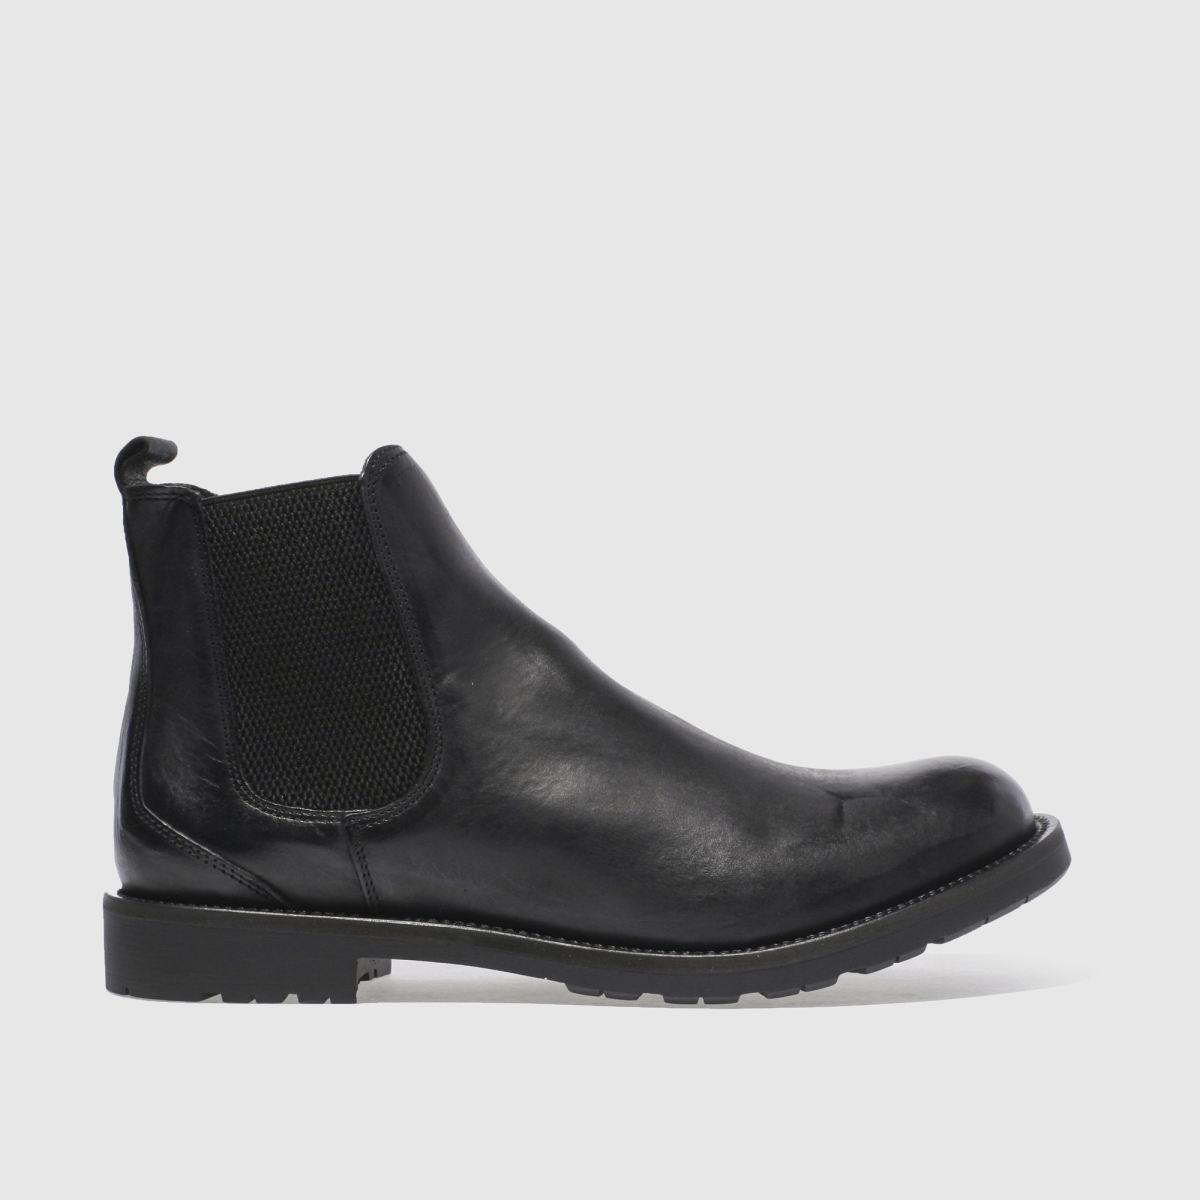 schuh black fletcher chelsea boots